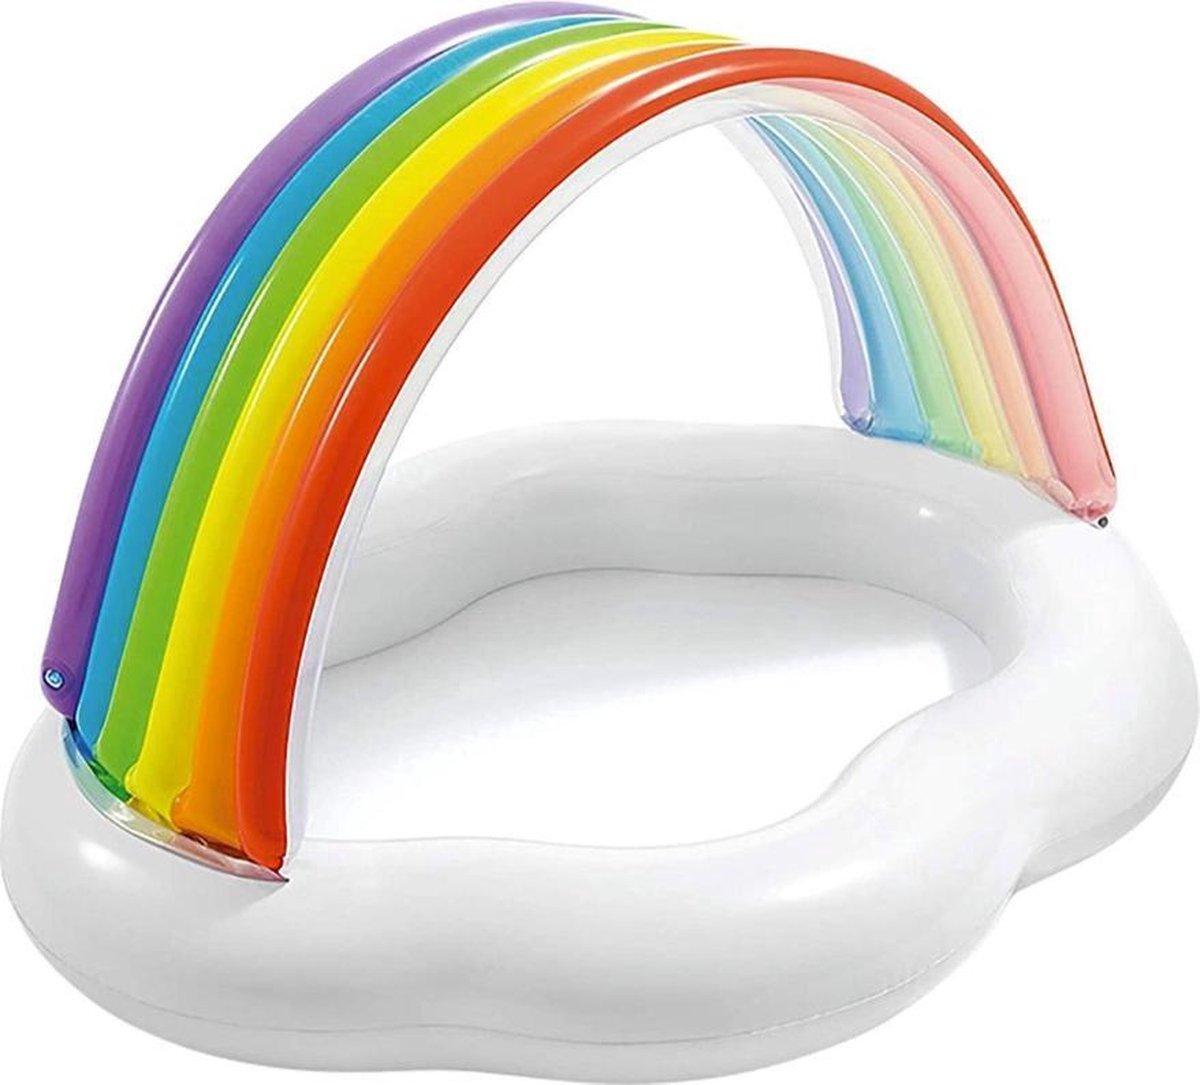 Intex Regenboog Opblaasbaar Kinder Zwembad - Baby Zwembad - Baby Zwembadje Met Afdak - 1-3 Jaar